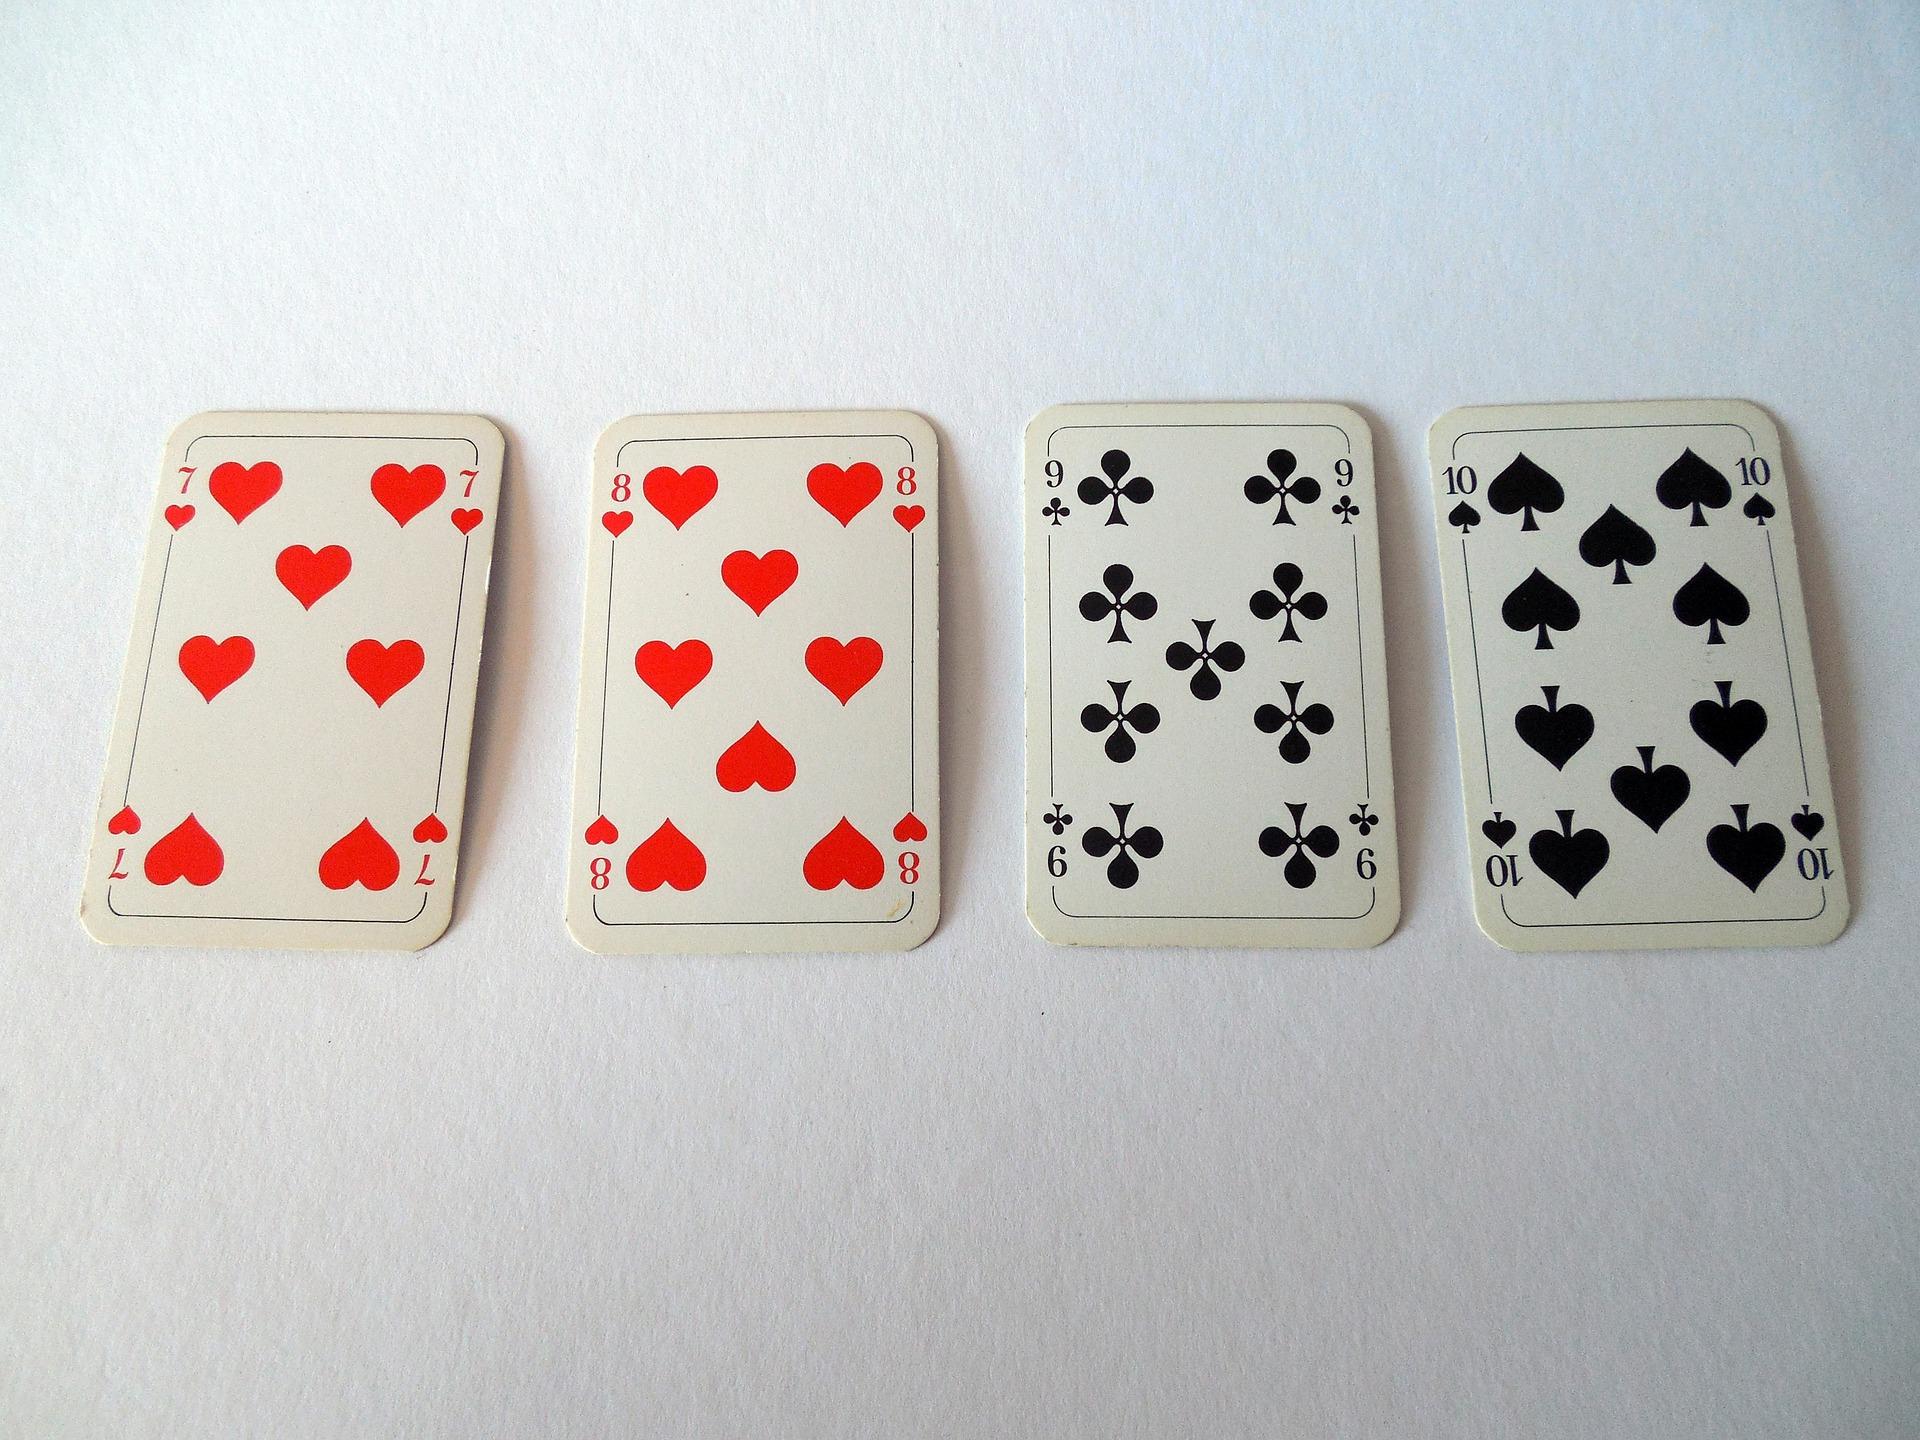 cards-769043_1920